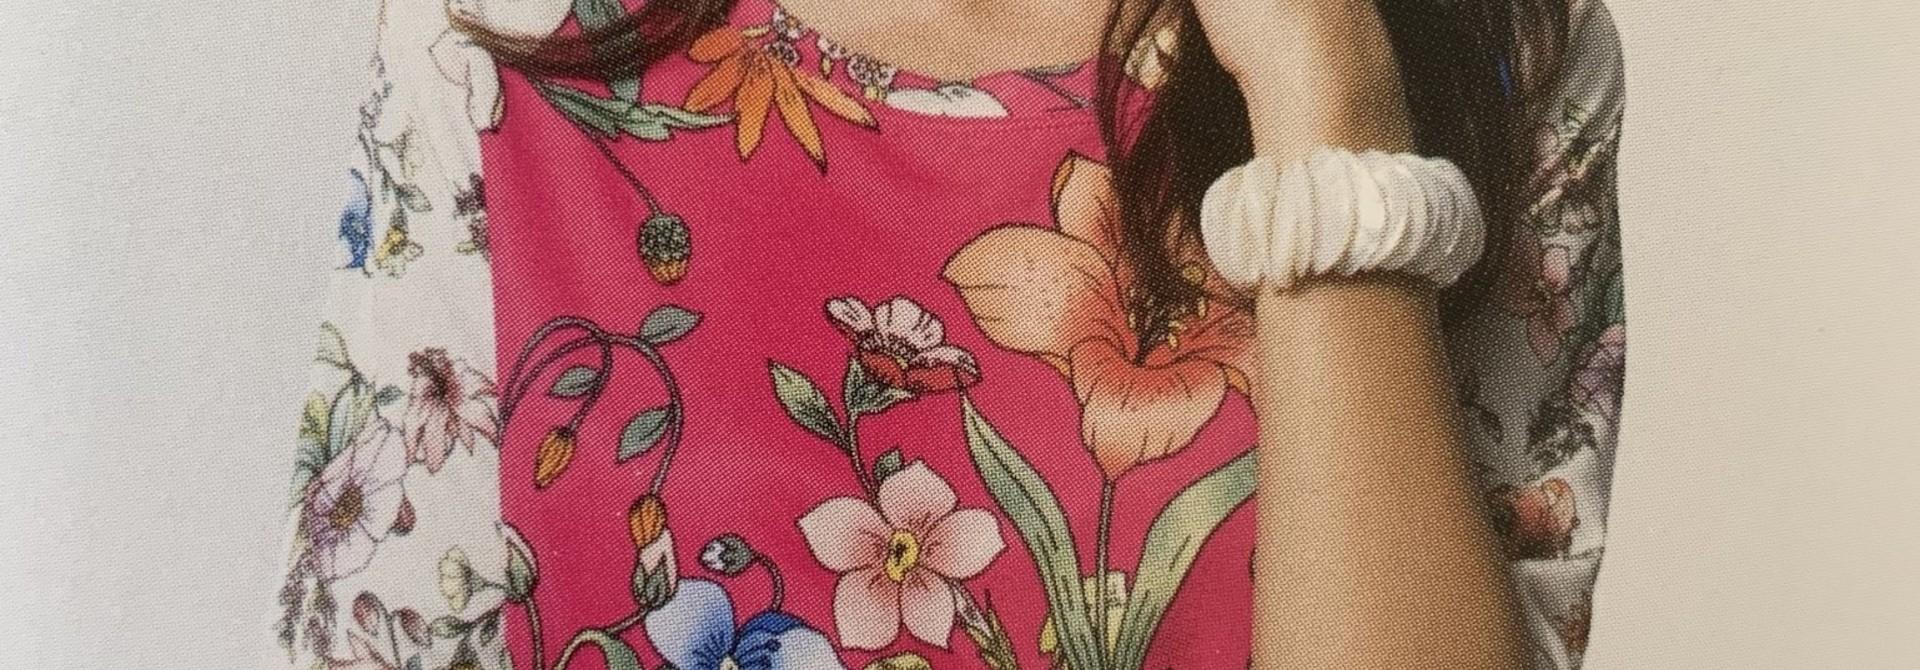 blouse stizzoli 213015